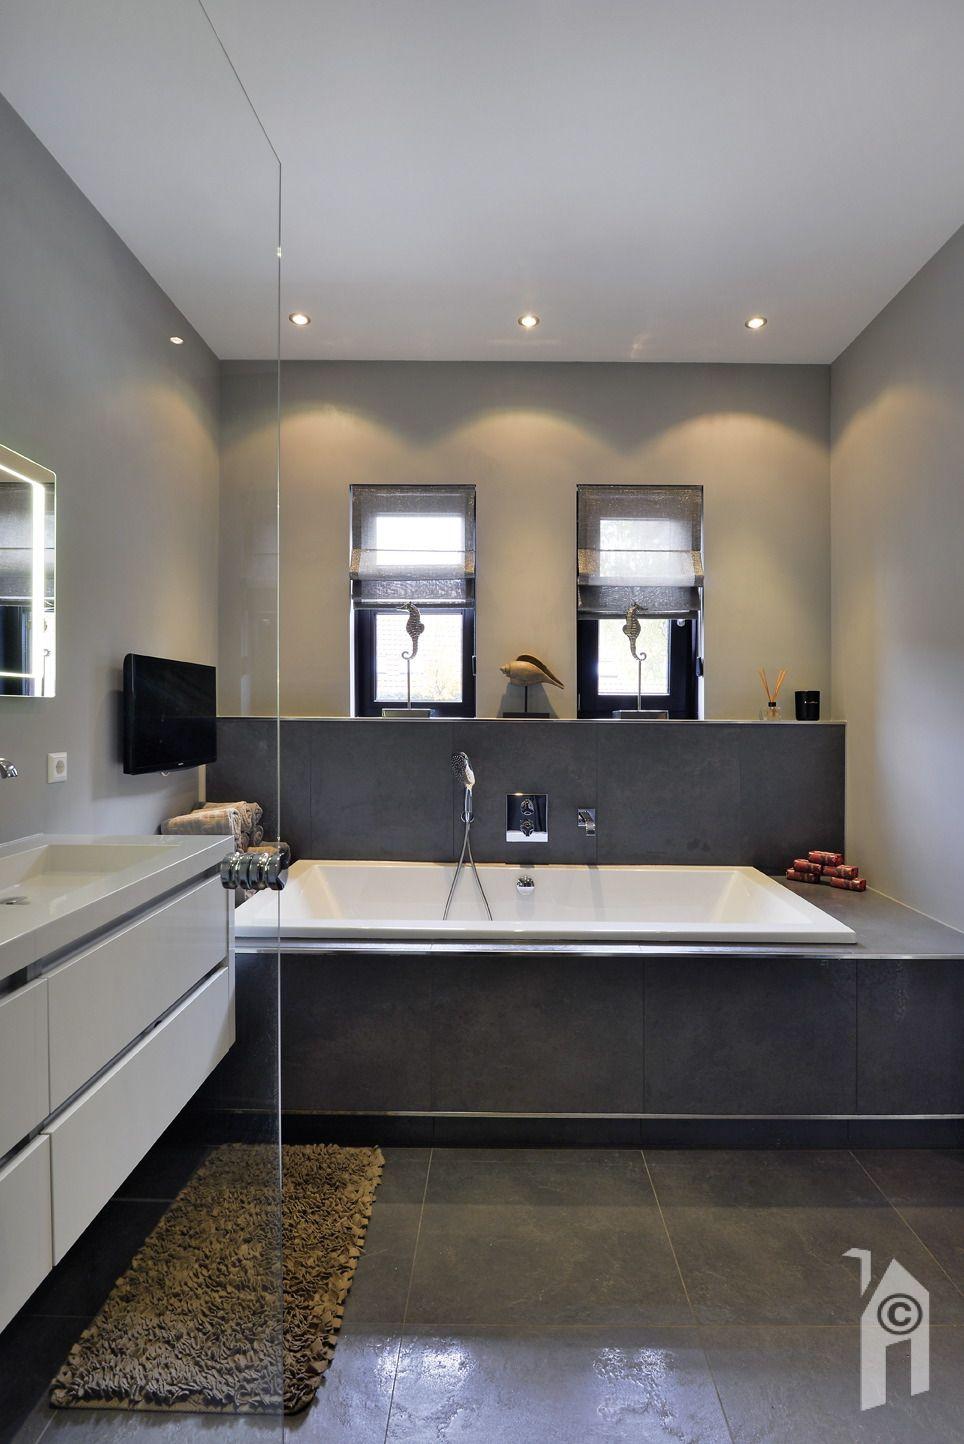 Mooie badkamer | WnS, landhuis | Pinterest